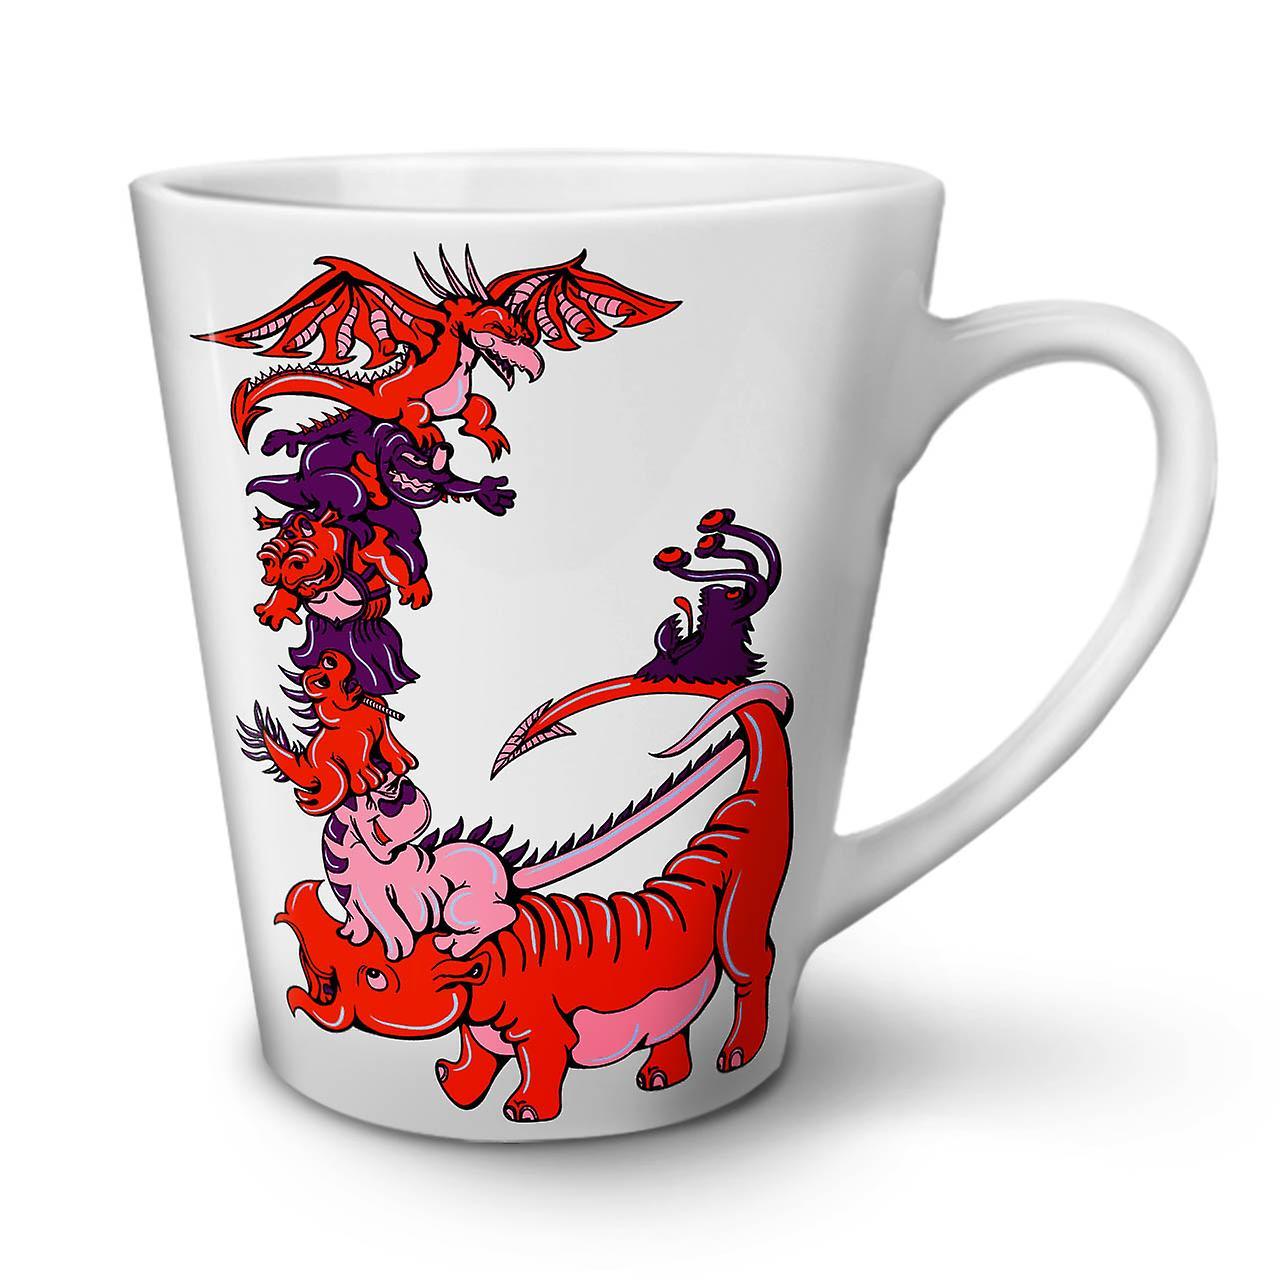 Tasse OzWellcoda Nouvelle En Animé Fantastique Café Dragon Dessin Blanche Céramique 12 Latte 6gybfY7